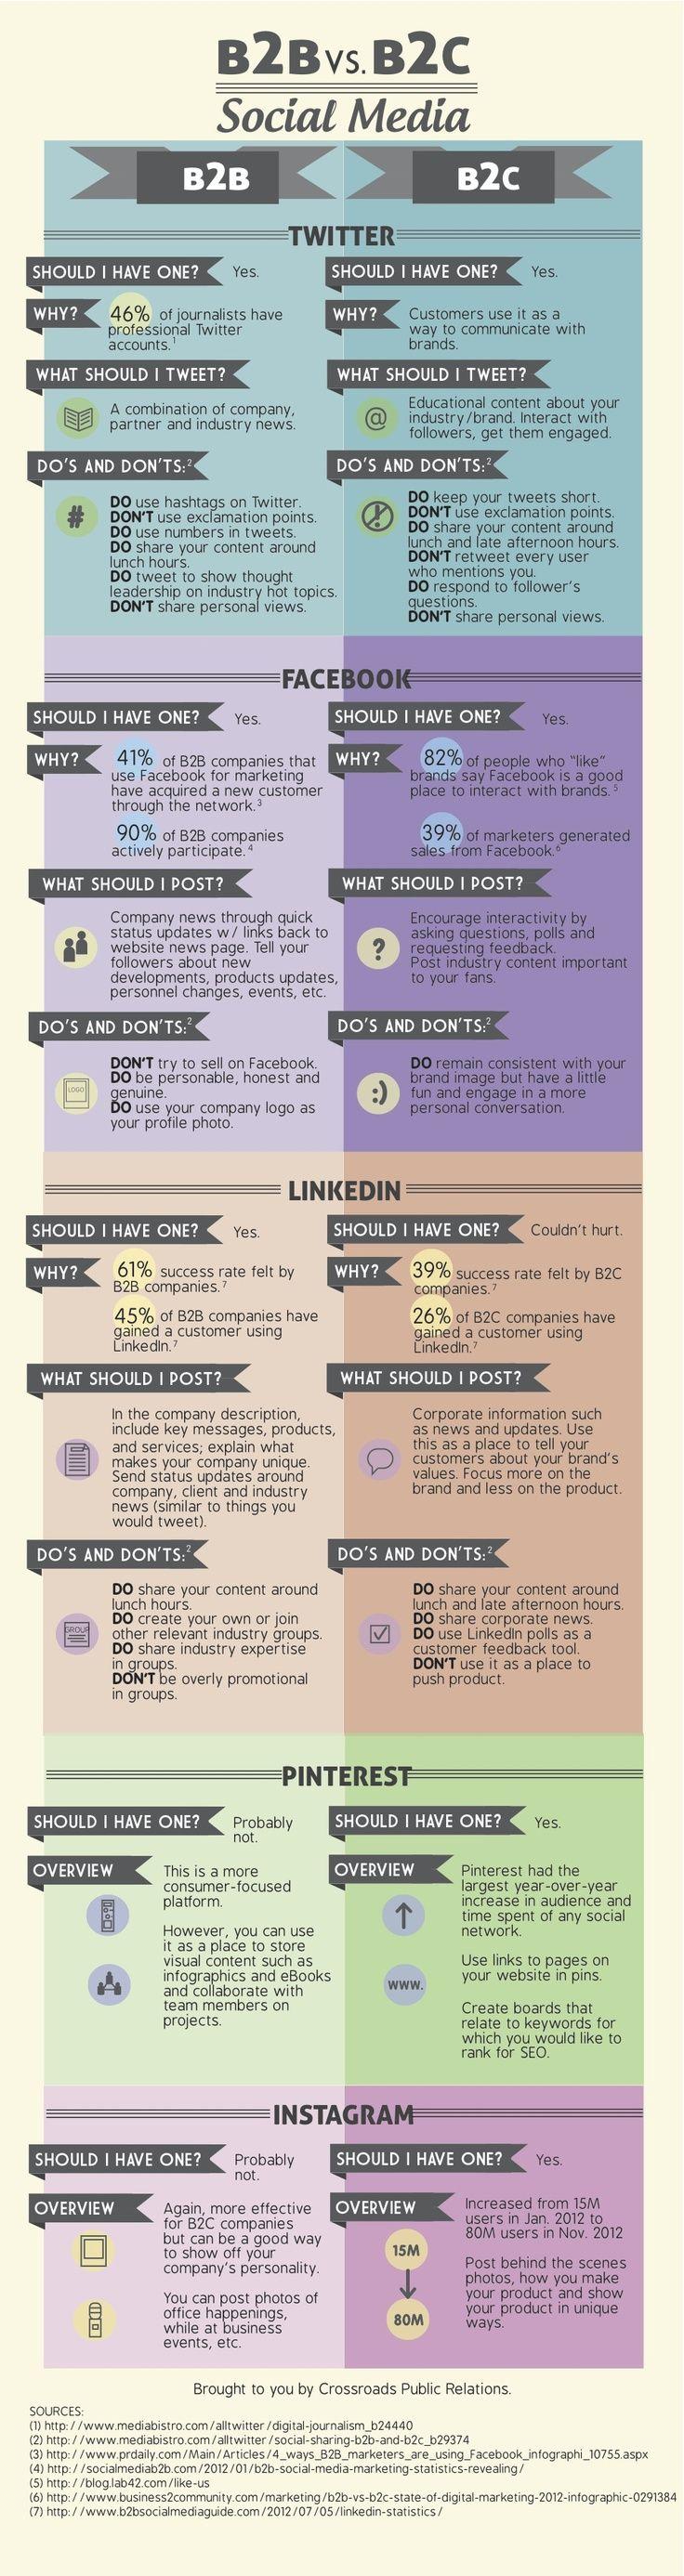 32 Great B2B and B2C Social Media Marketing Tips